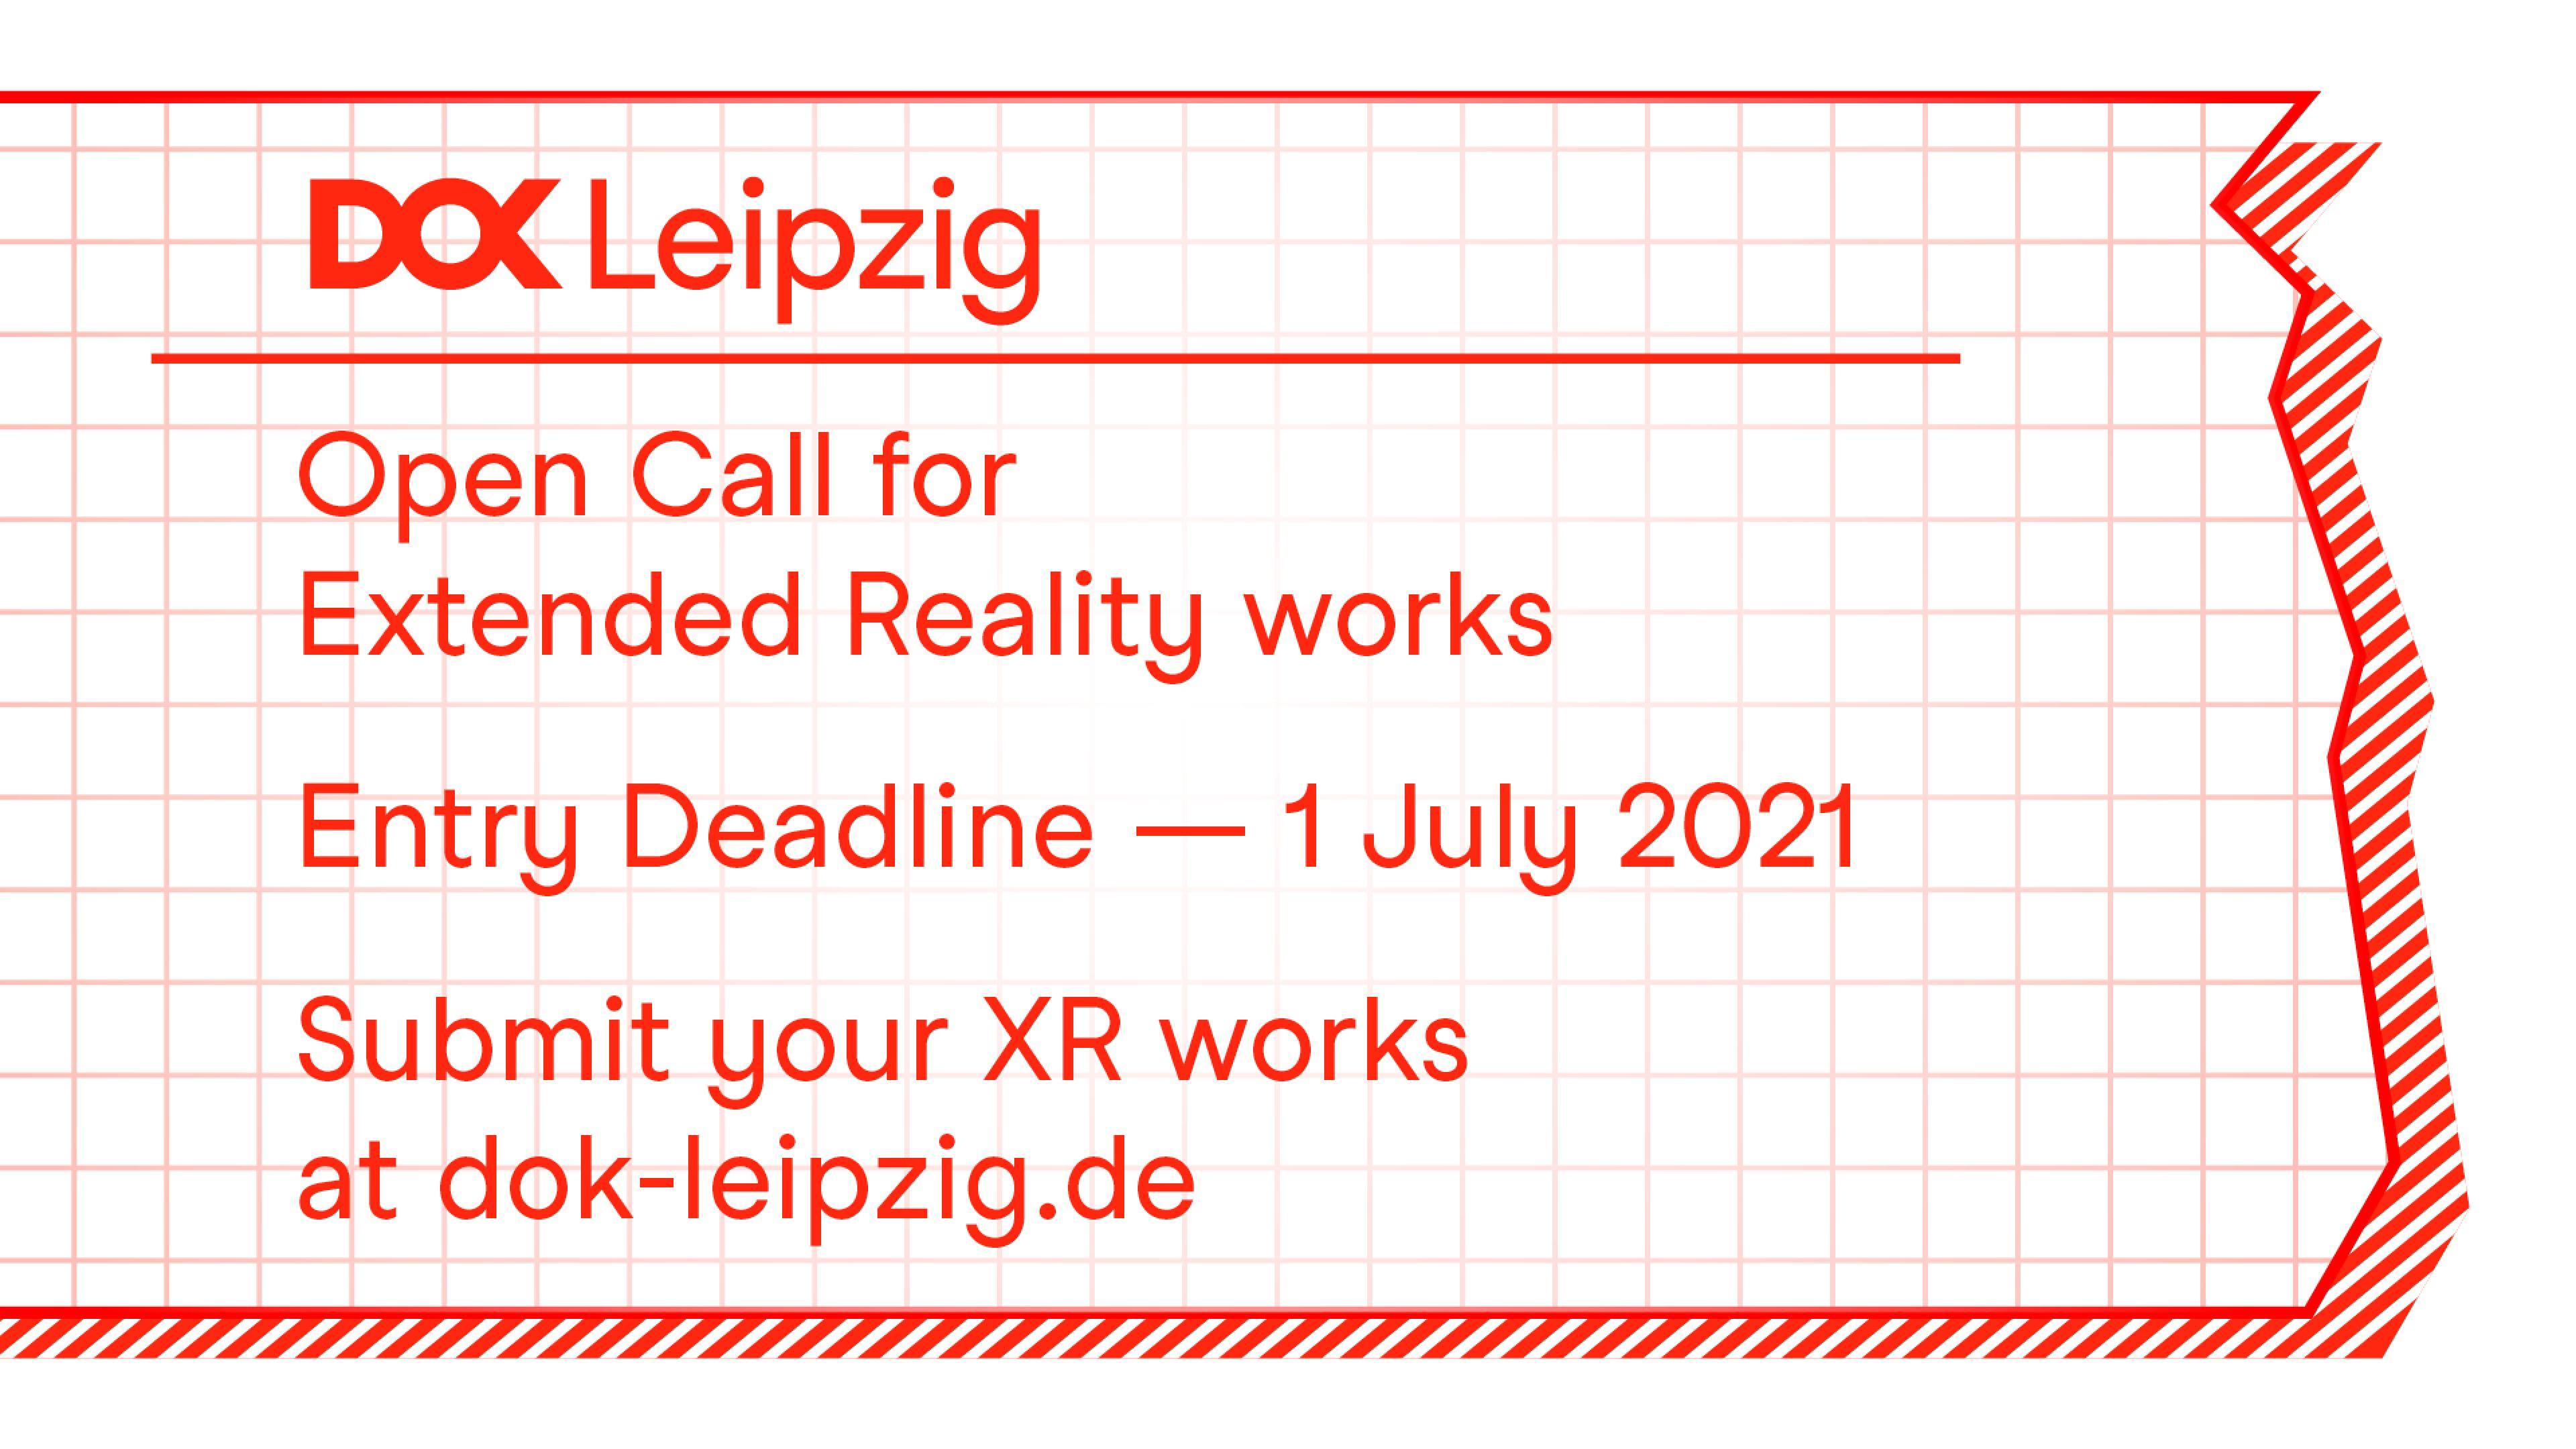 Illustration eines Abreißzettels auf Karopapier mit Text: Open Call for Extended Reality works. Entry Deadline 1 July 2021.